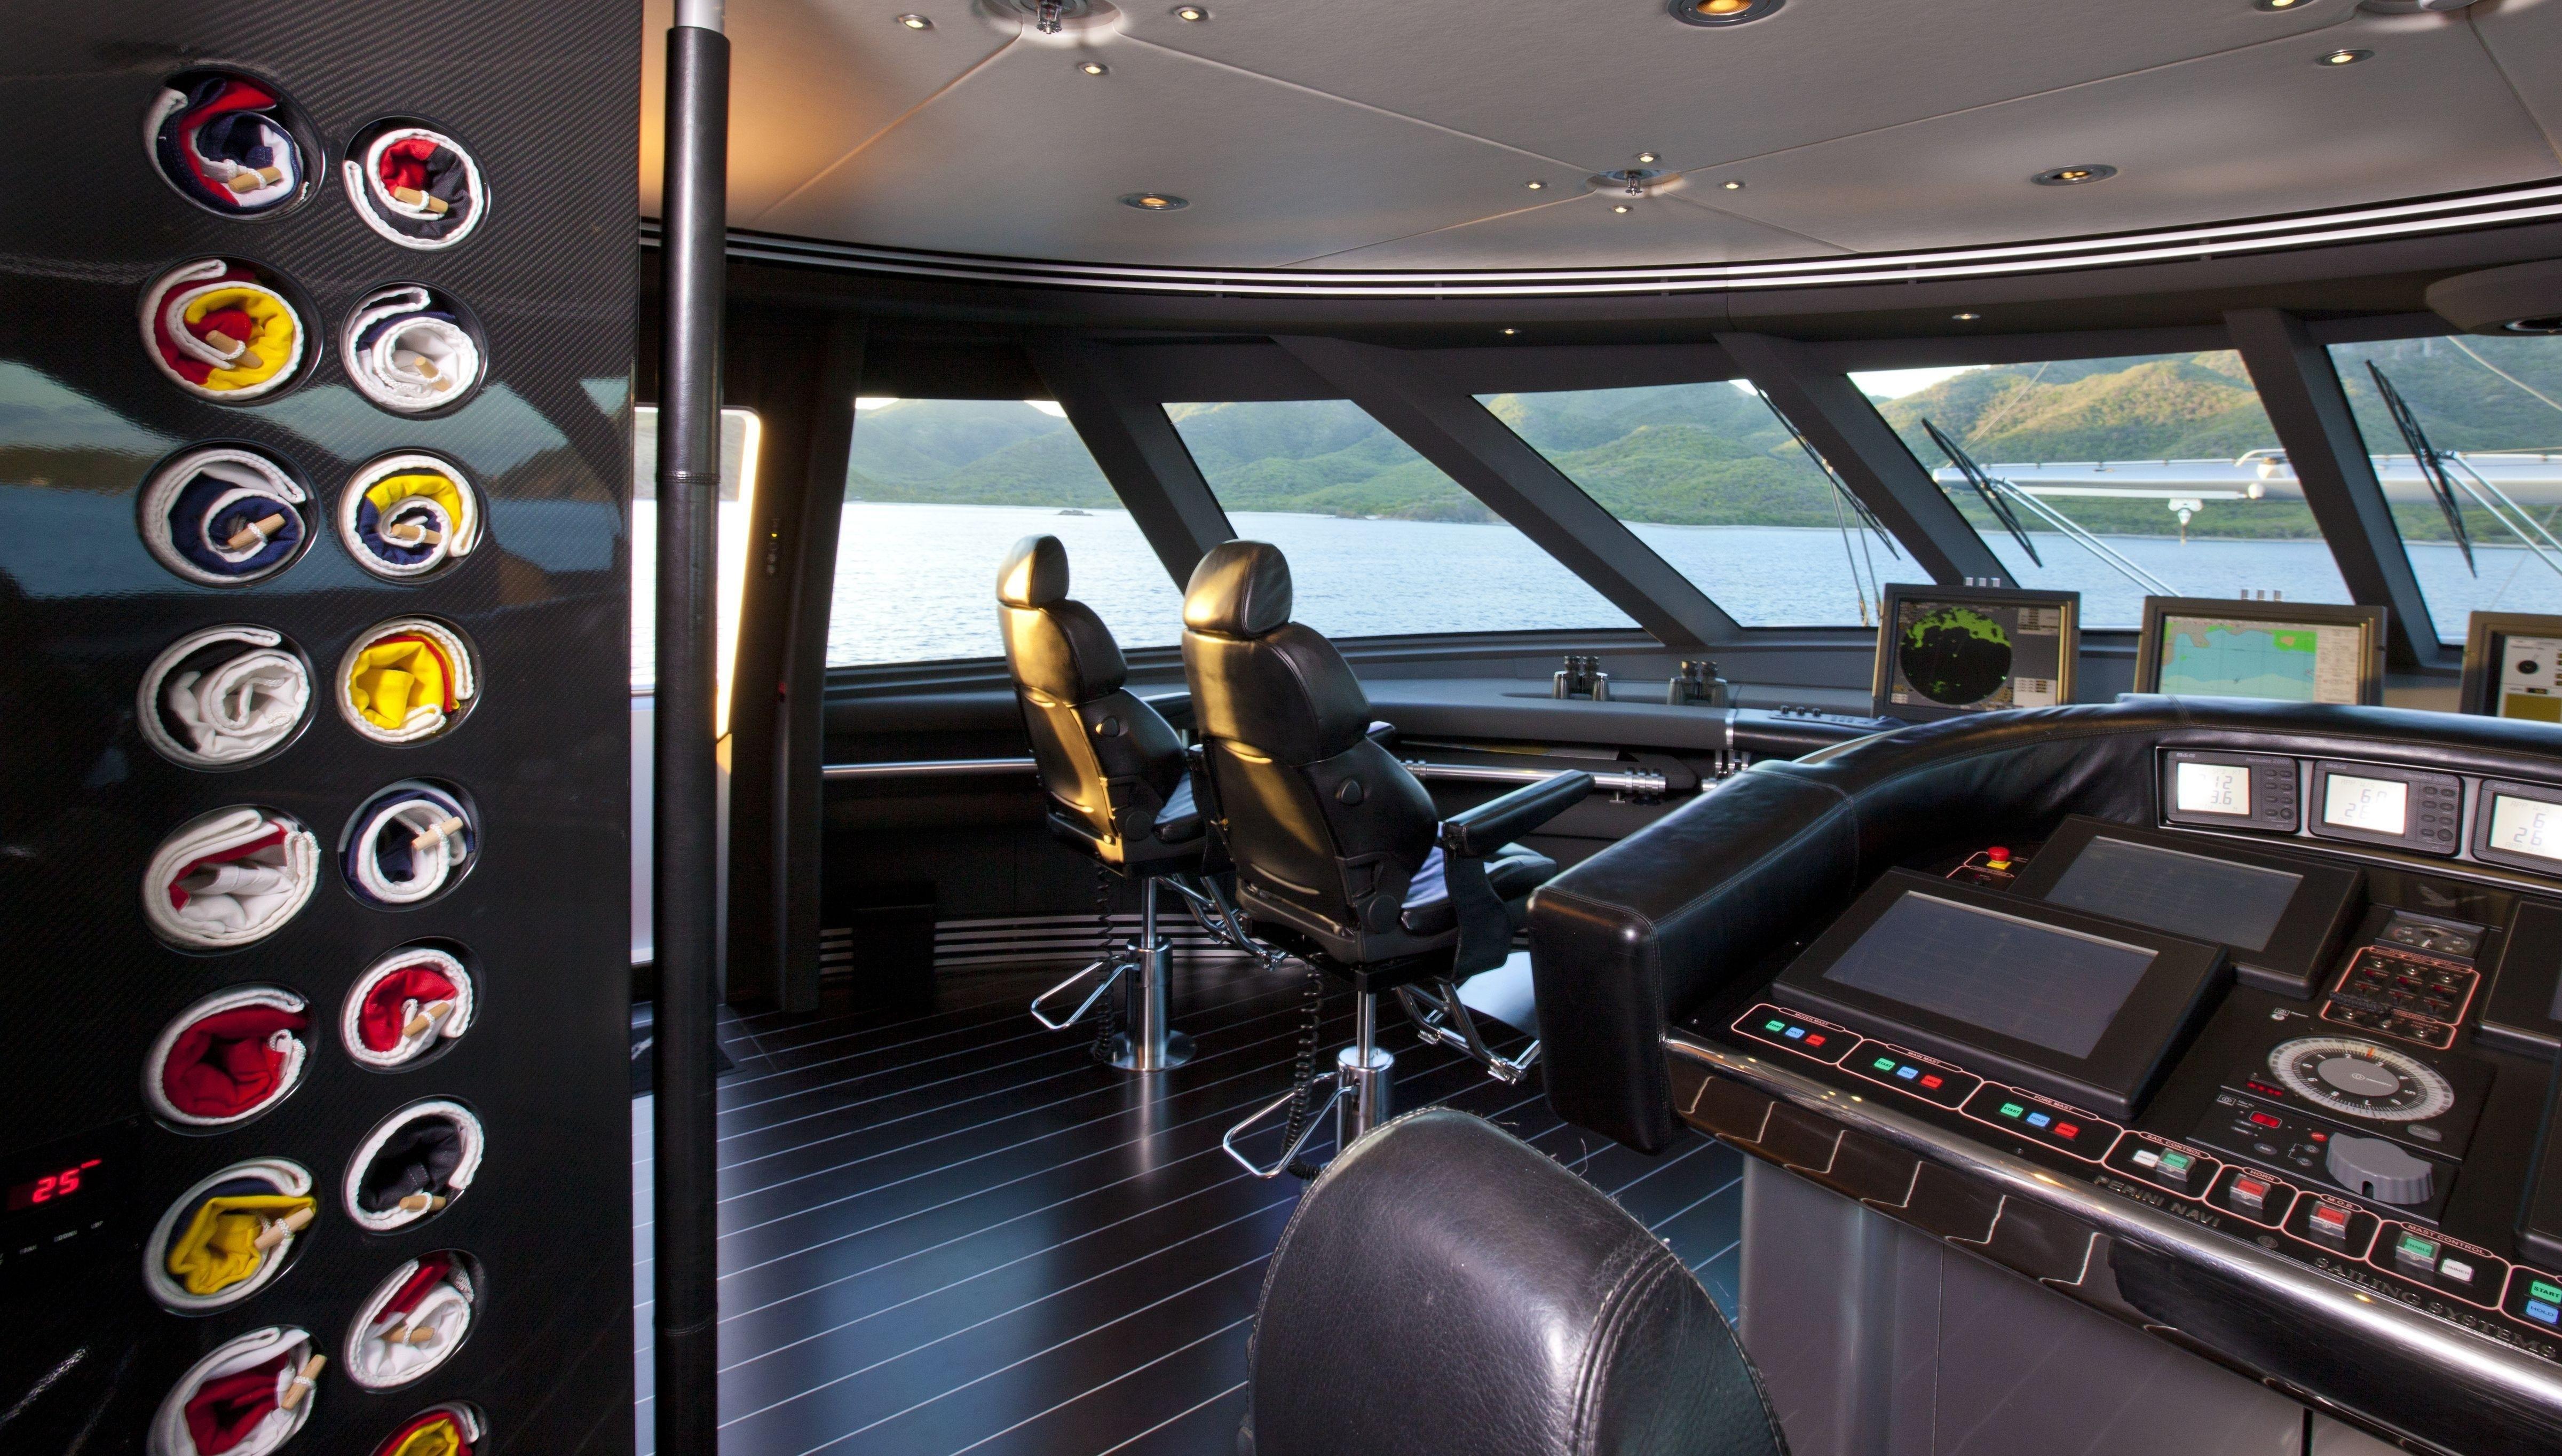 Bridgedeck Instrumentation On Yacht MALTESE FALCON